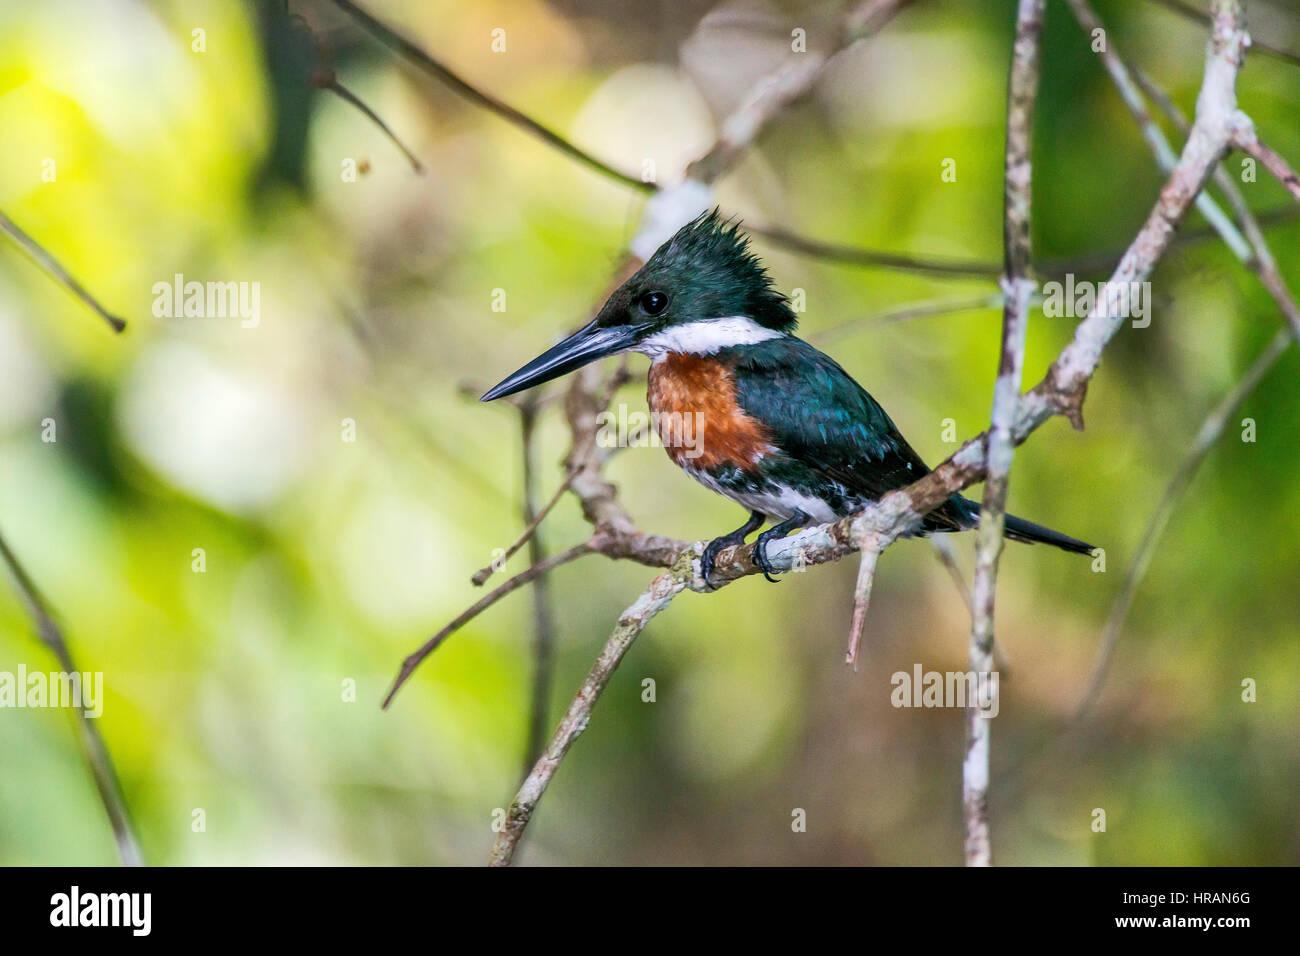 Kingfisher verde hembra (Chloroceryle americana), fotografiado en Sooretama/Linhares, Espírito Santo, sudeste Imagen De Stock